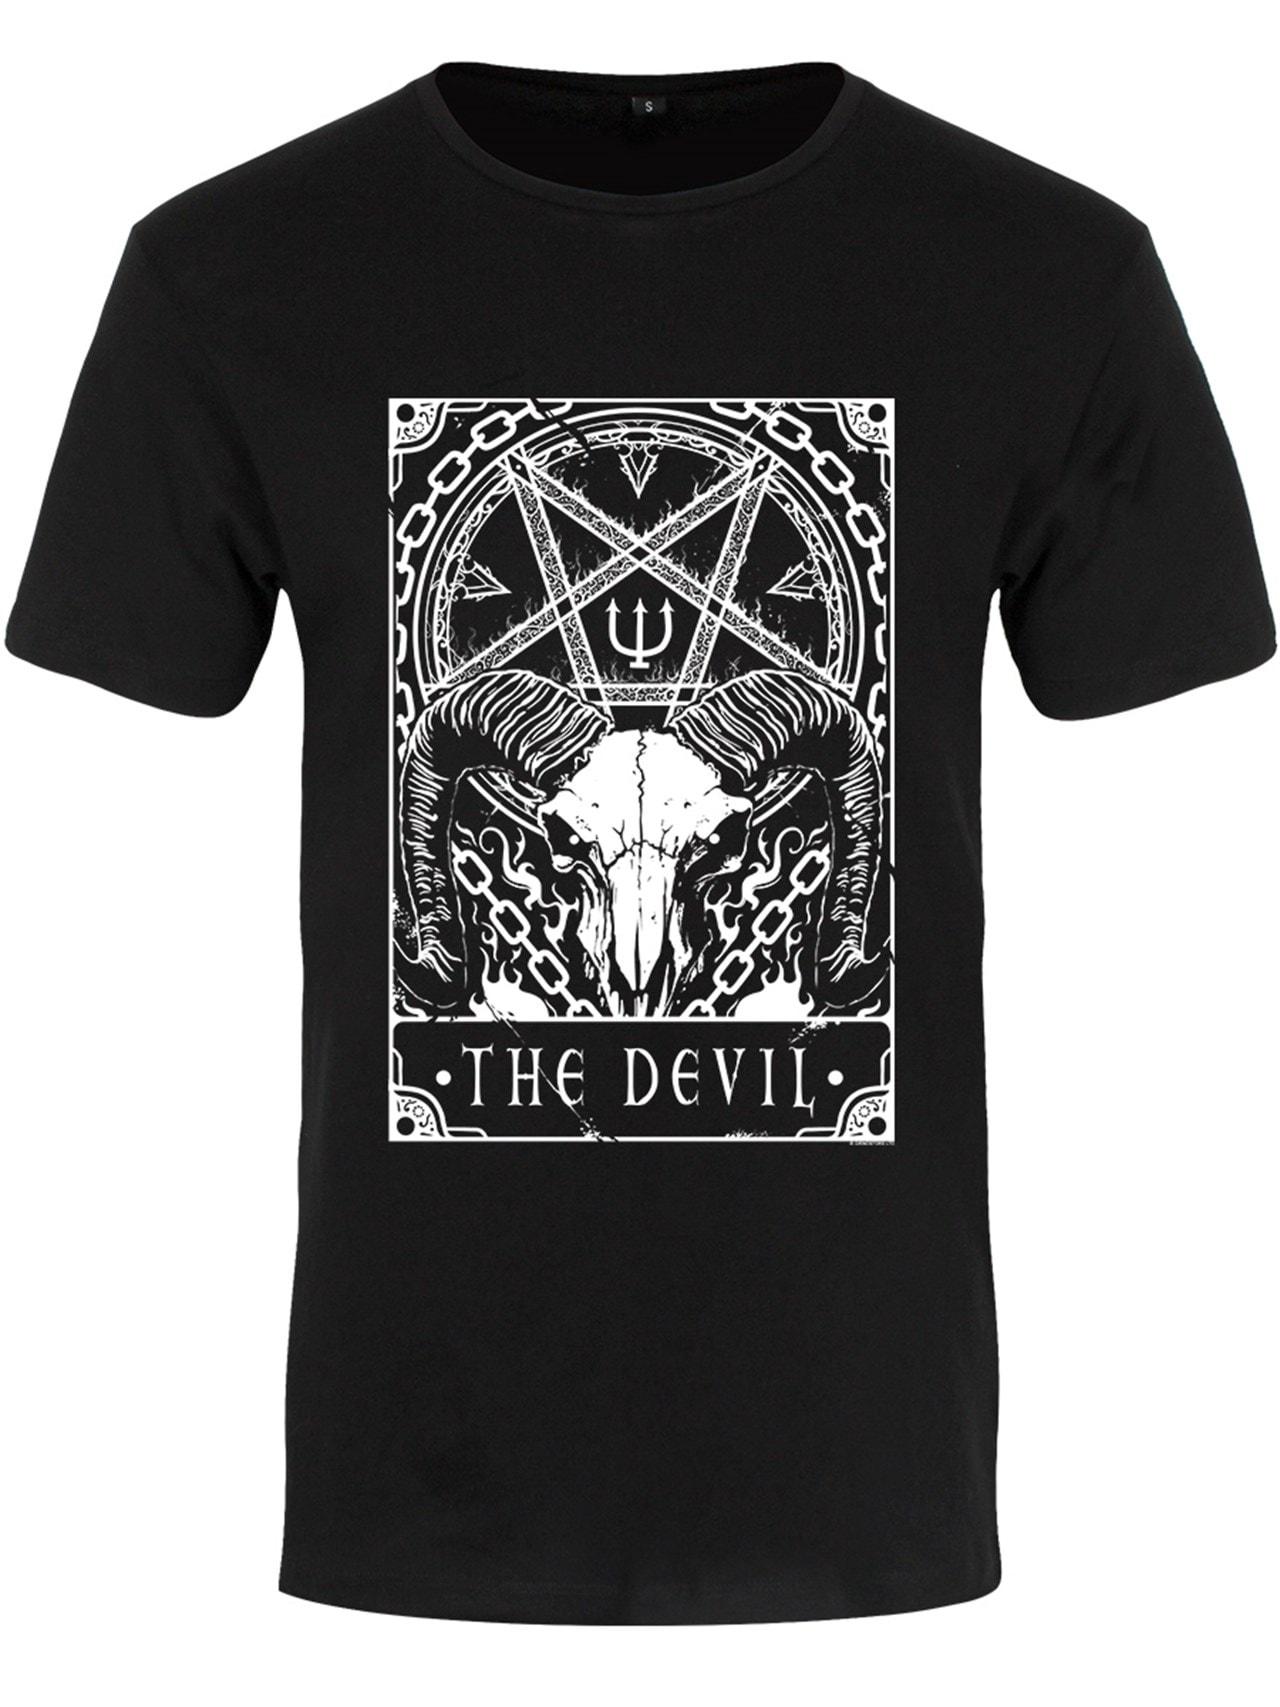 Deadly Tarot: The Devil (Small) - 1